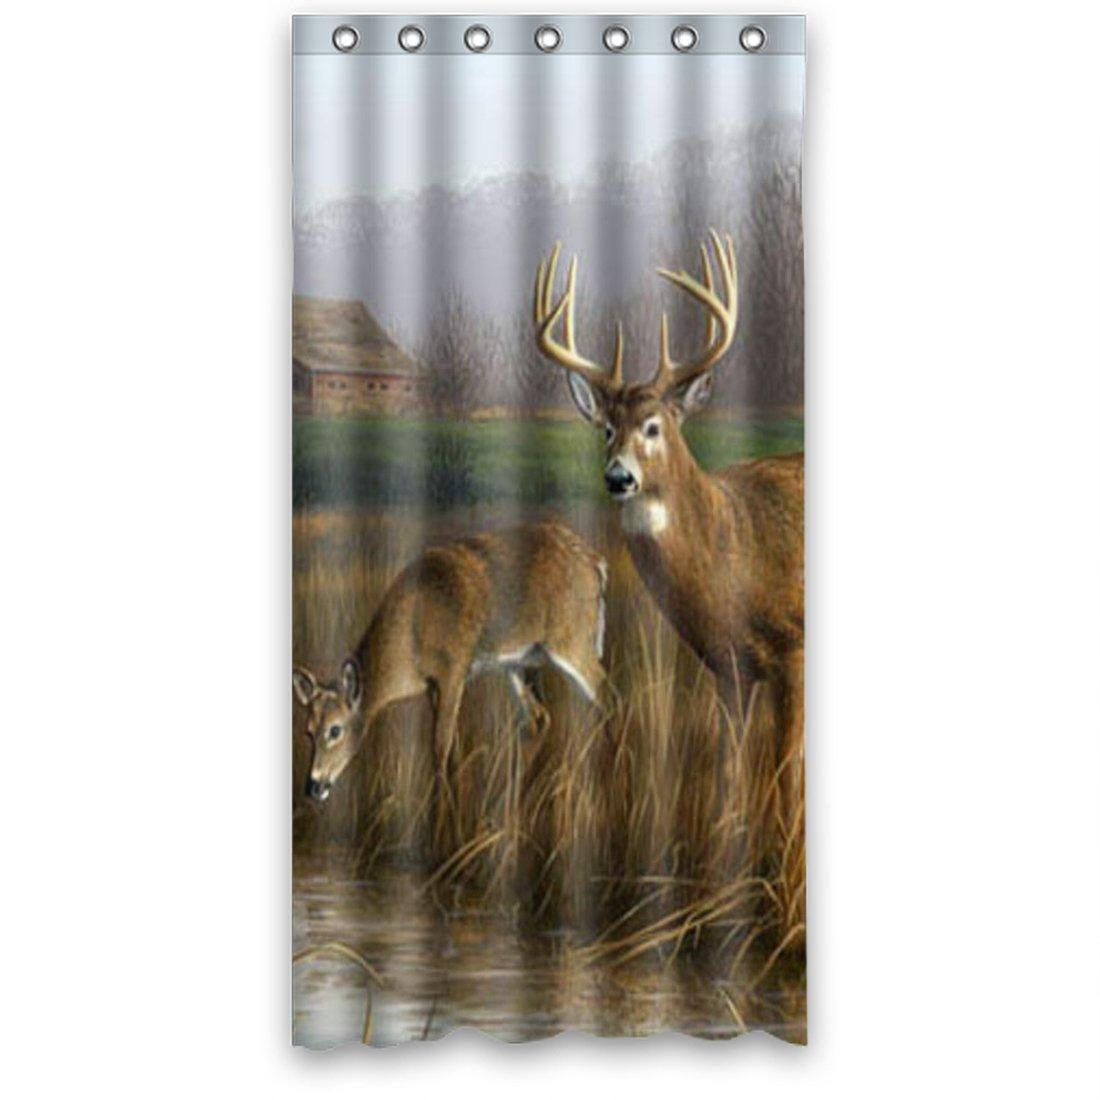 "Delightful Style Friendly Cute Gentle Run freely Wildlife Animals Deer Waterproof Polyester Fabric Bath Shower Curtain 36"" x 72"""